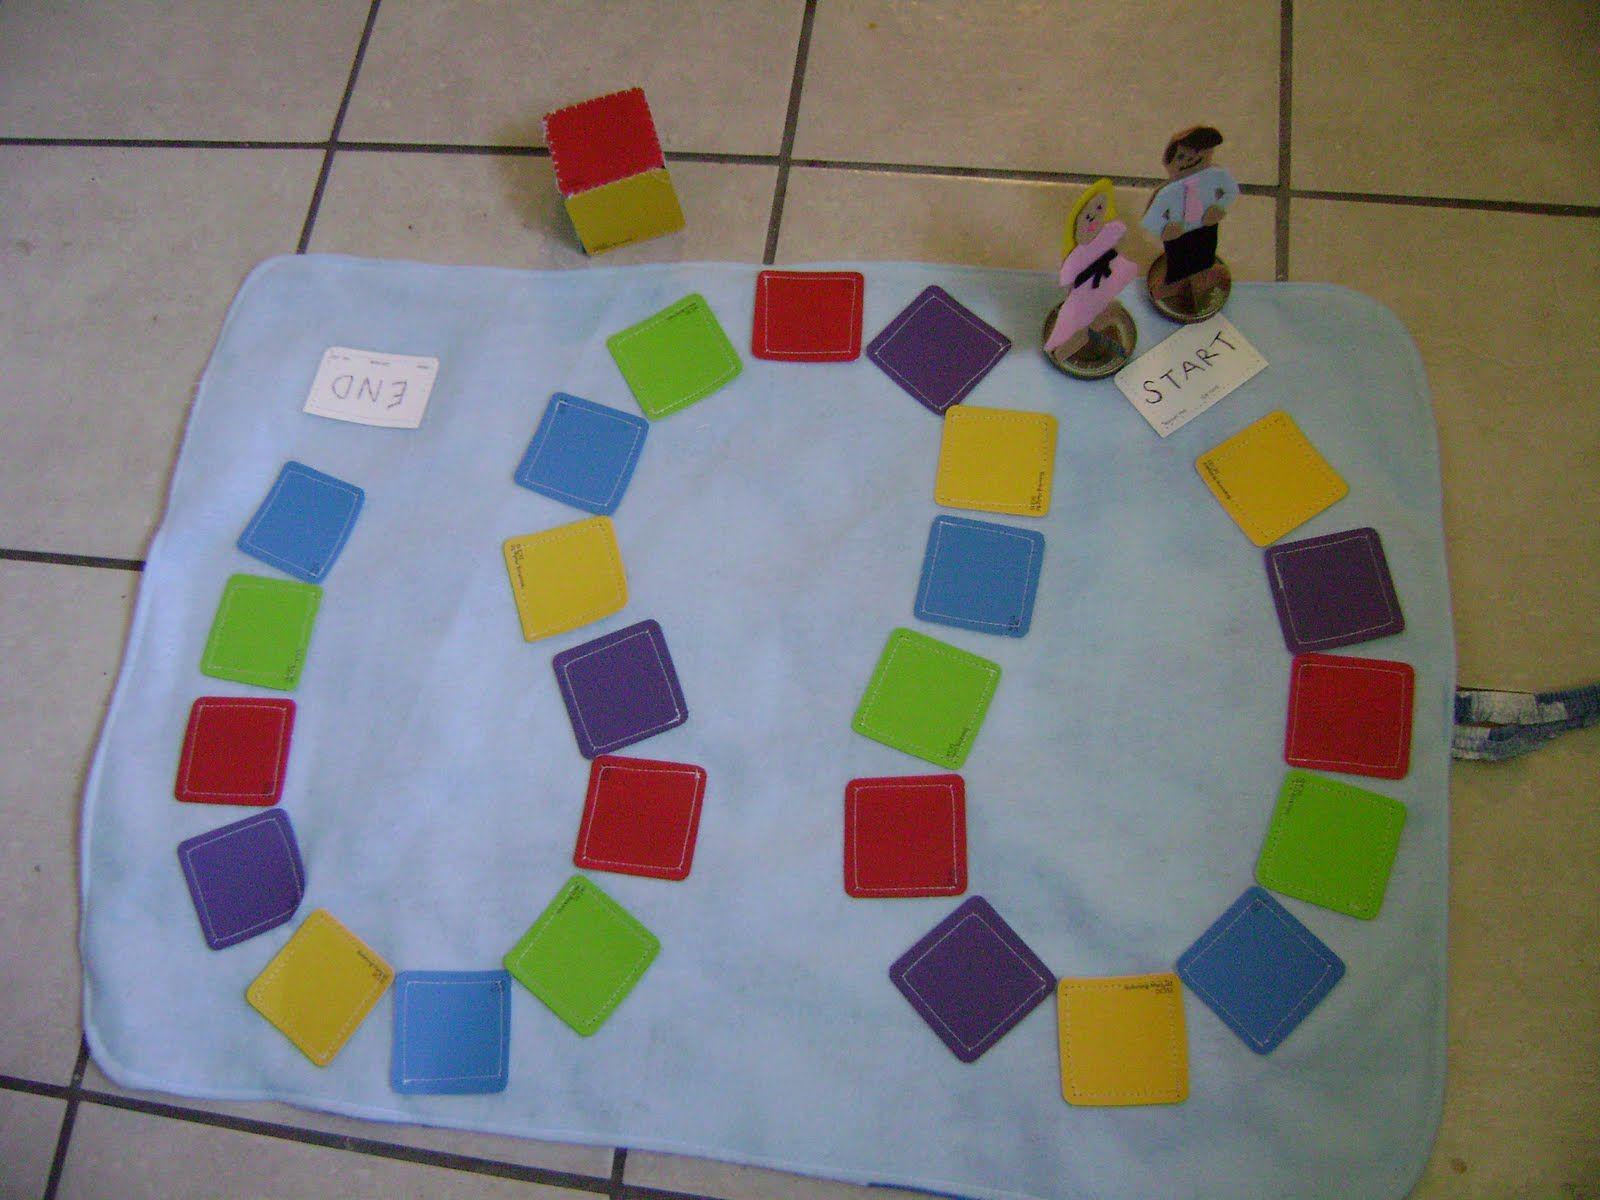 make your own board game using paint chips lernen. Black Bedroom Furniture Sets. Home Design Ideas